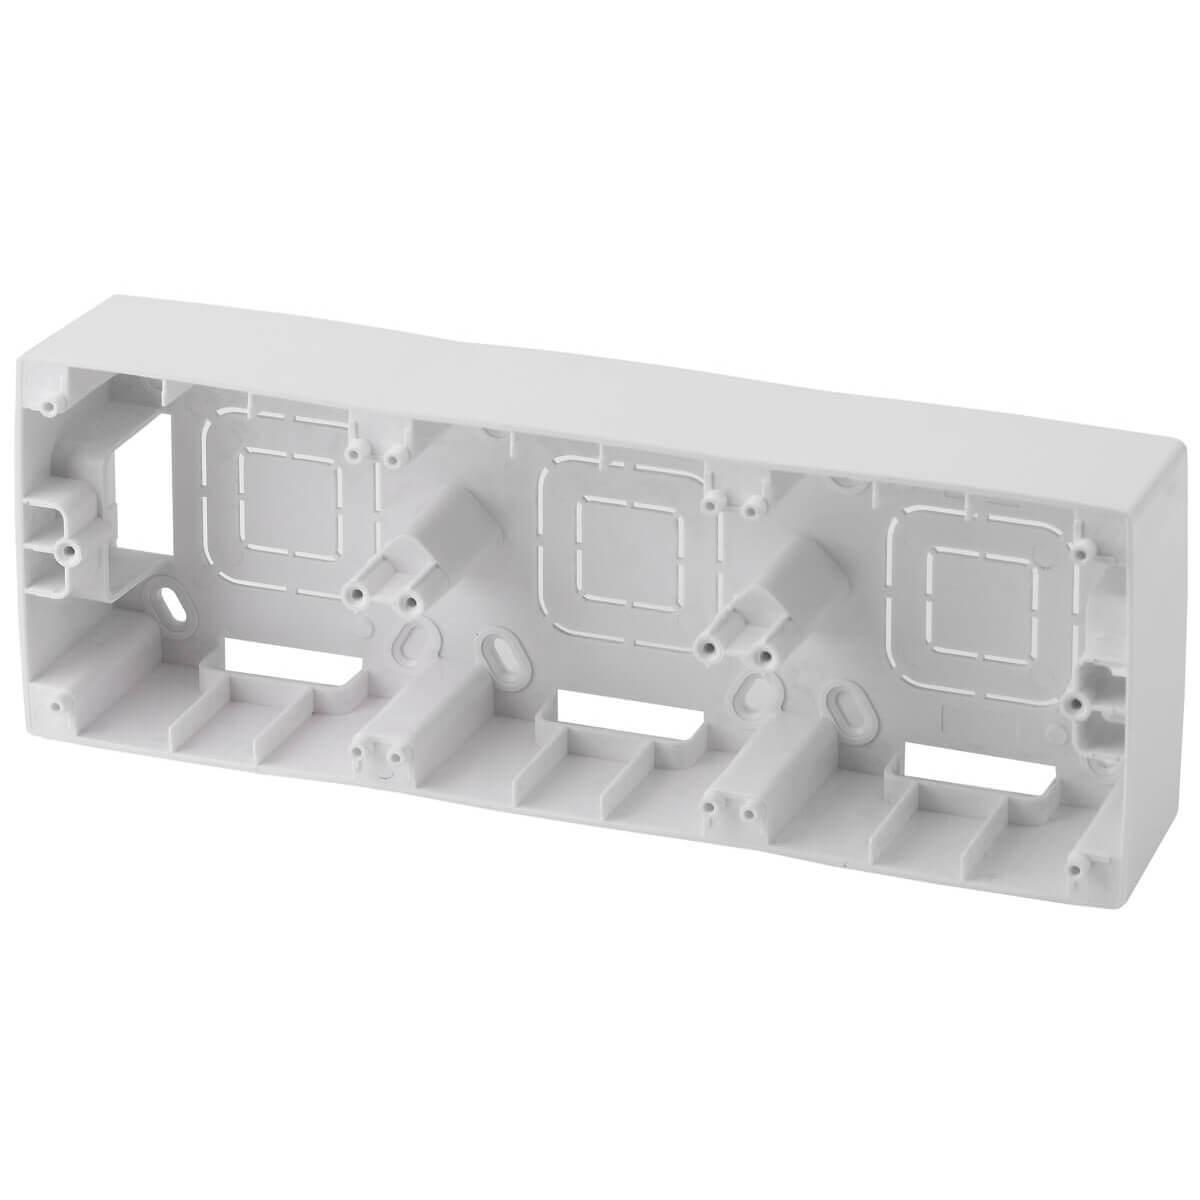 Монтажная коробка ЭРА 12-6103-01 Эра12